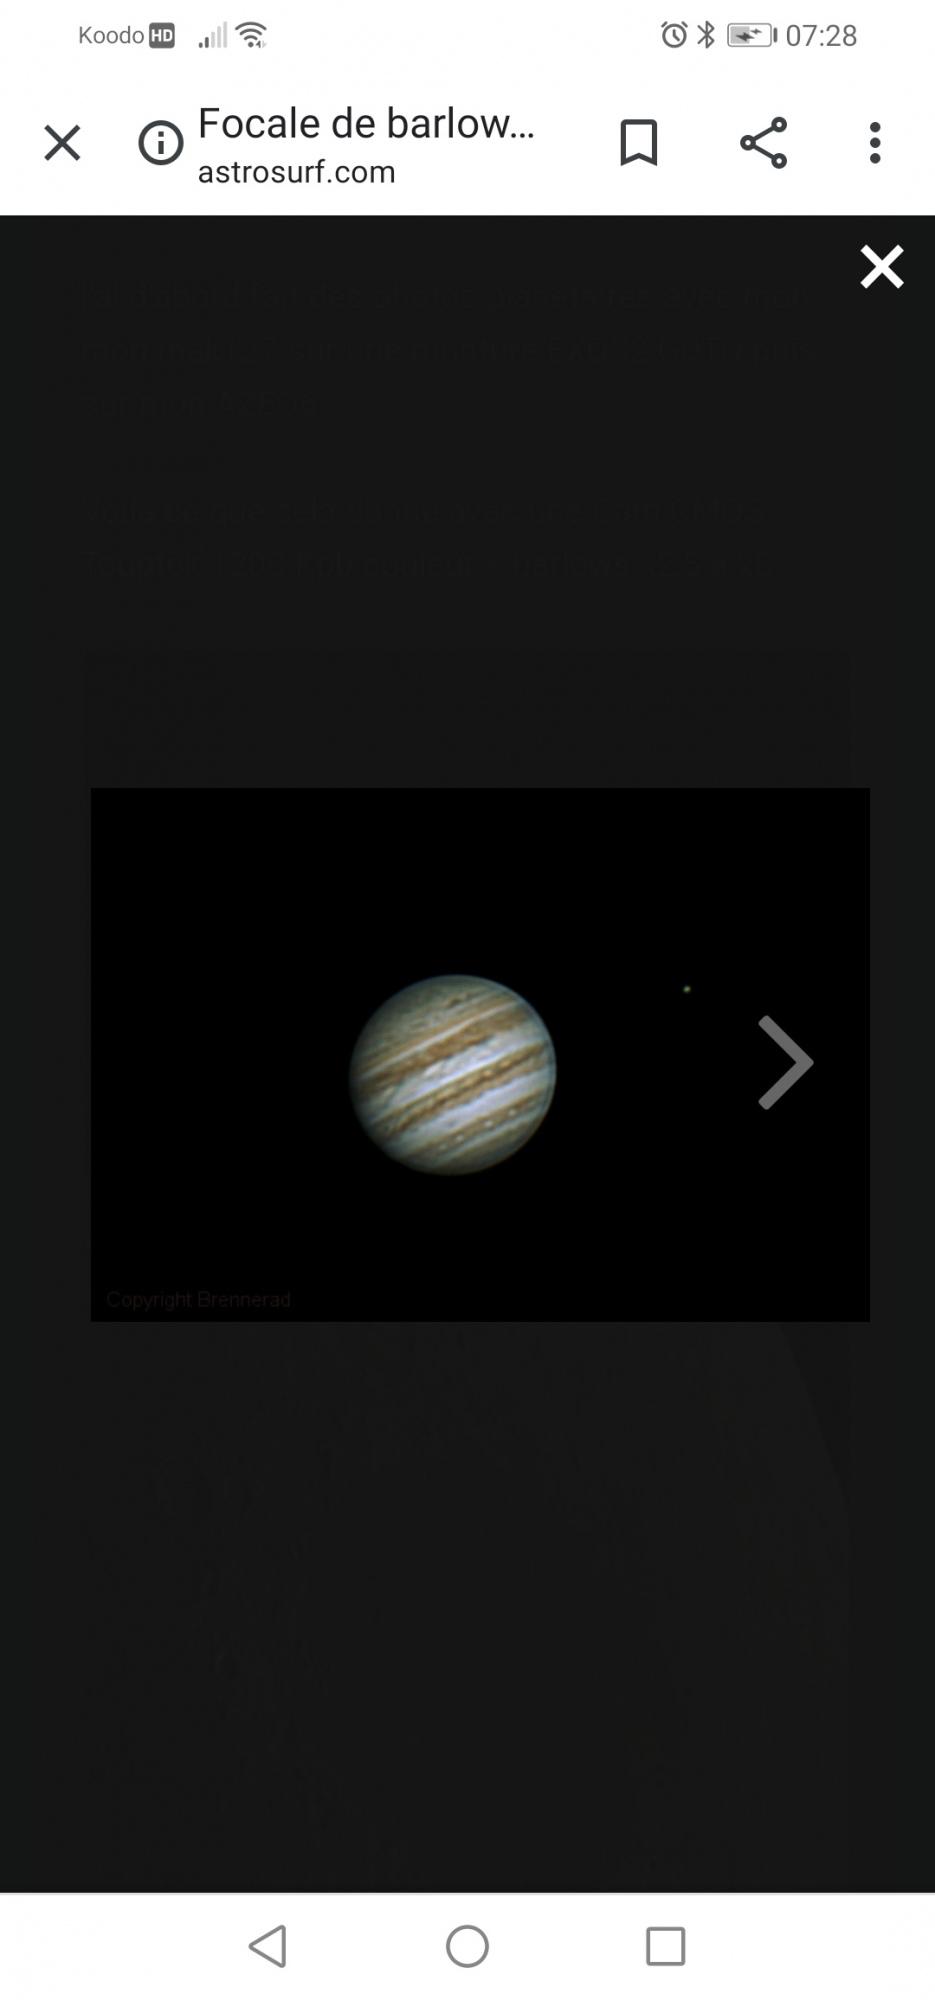 Screenshot_20200810_072800_com.android.chrome.thumb.jpg.c793884369cae317b99da84f9b2eecea.jpg